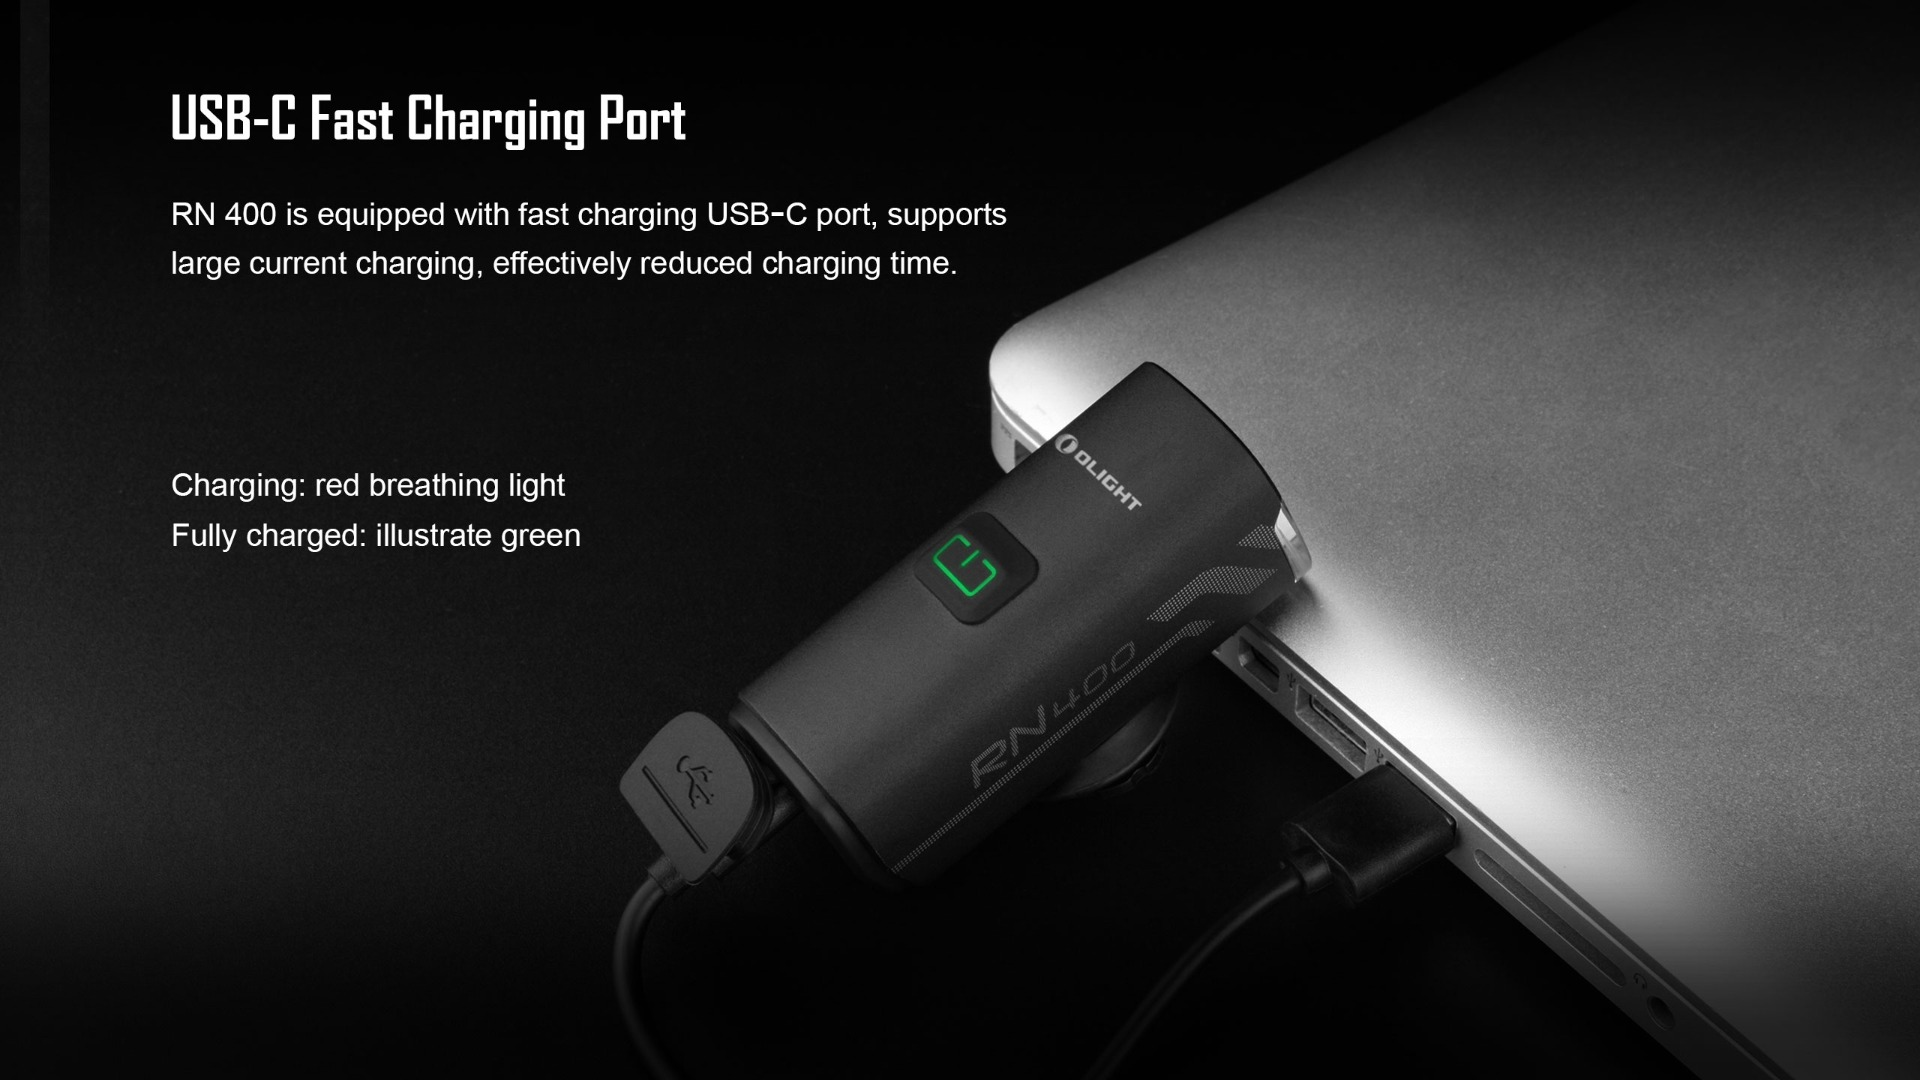 Olight RN 400 Bike LED Light Headlight USB-C Charging